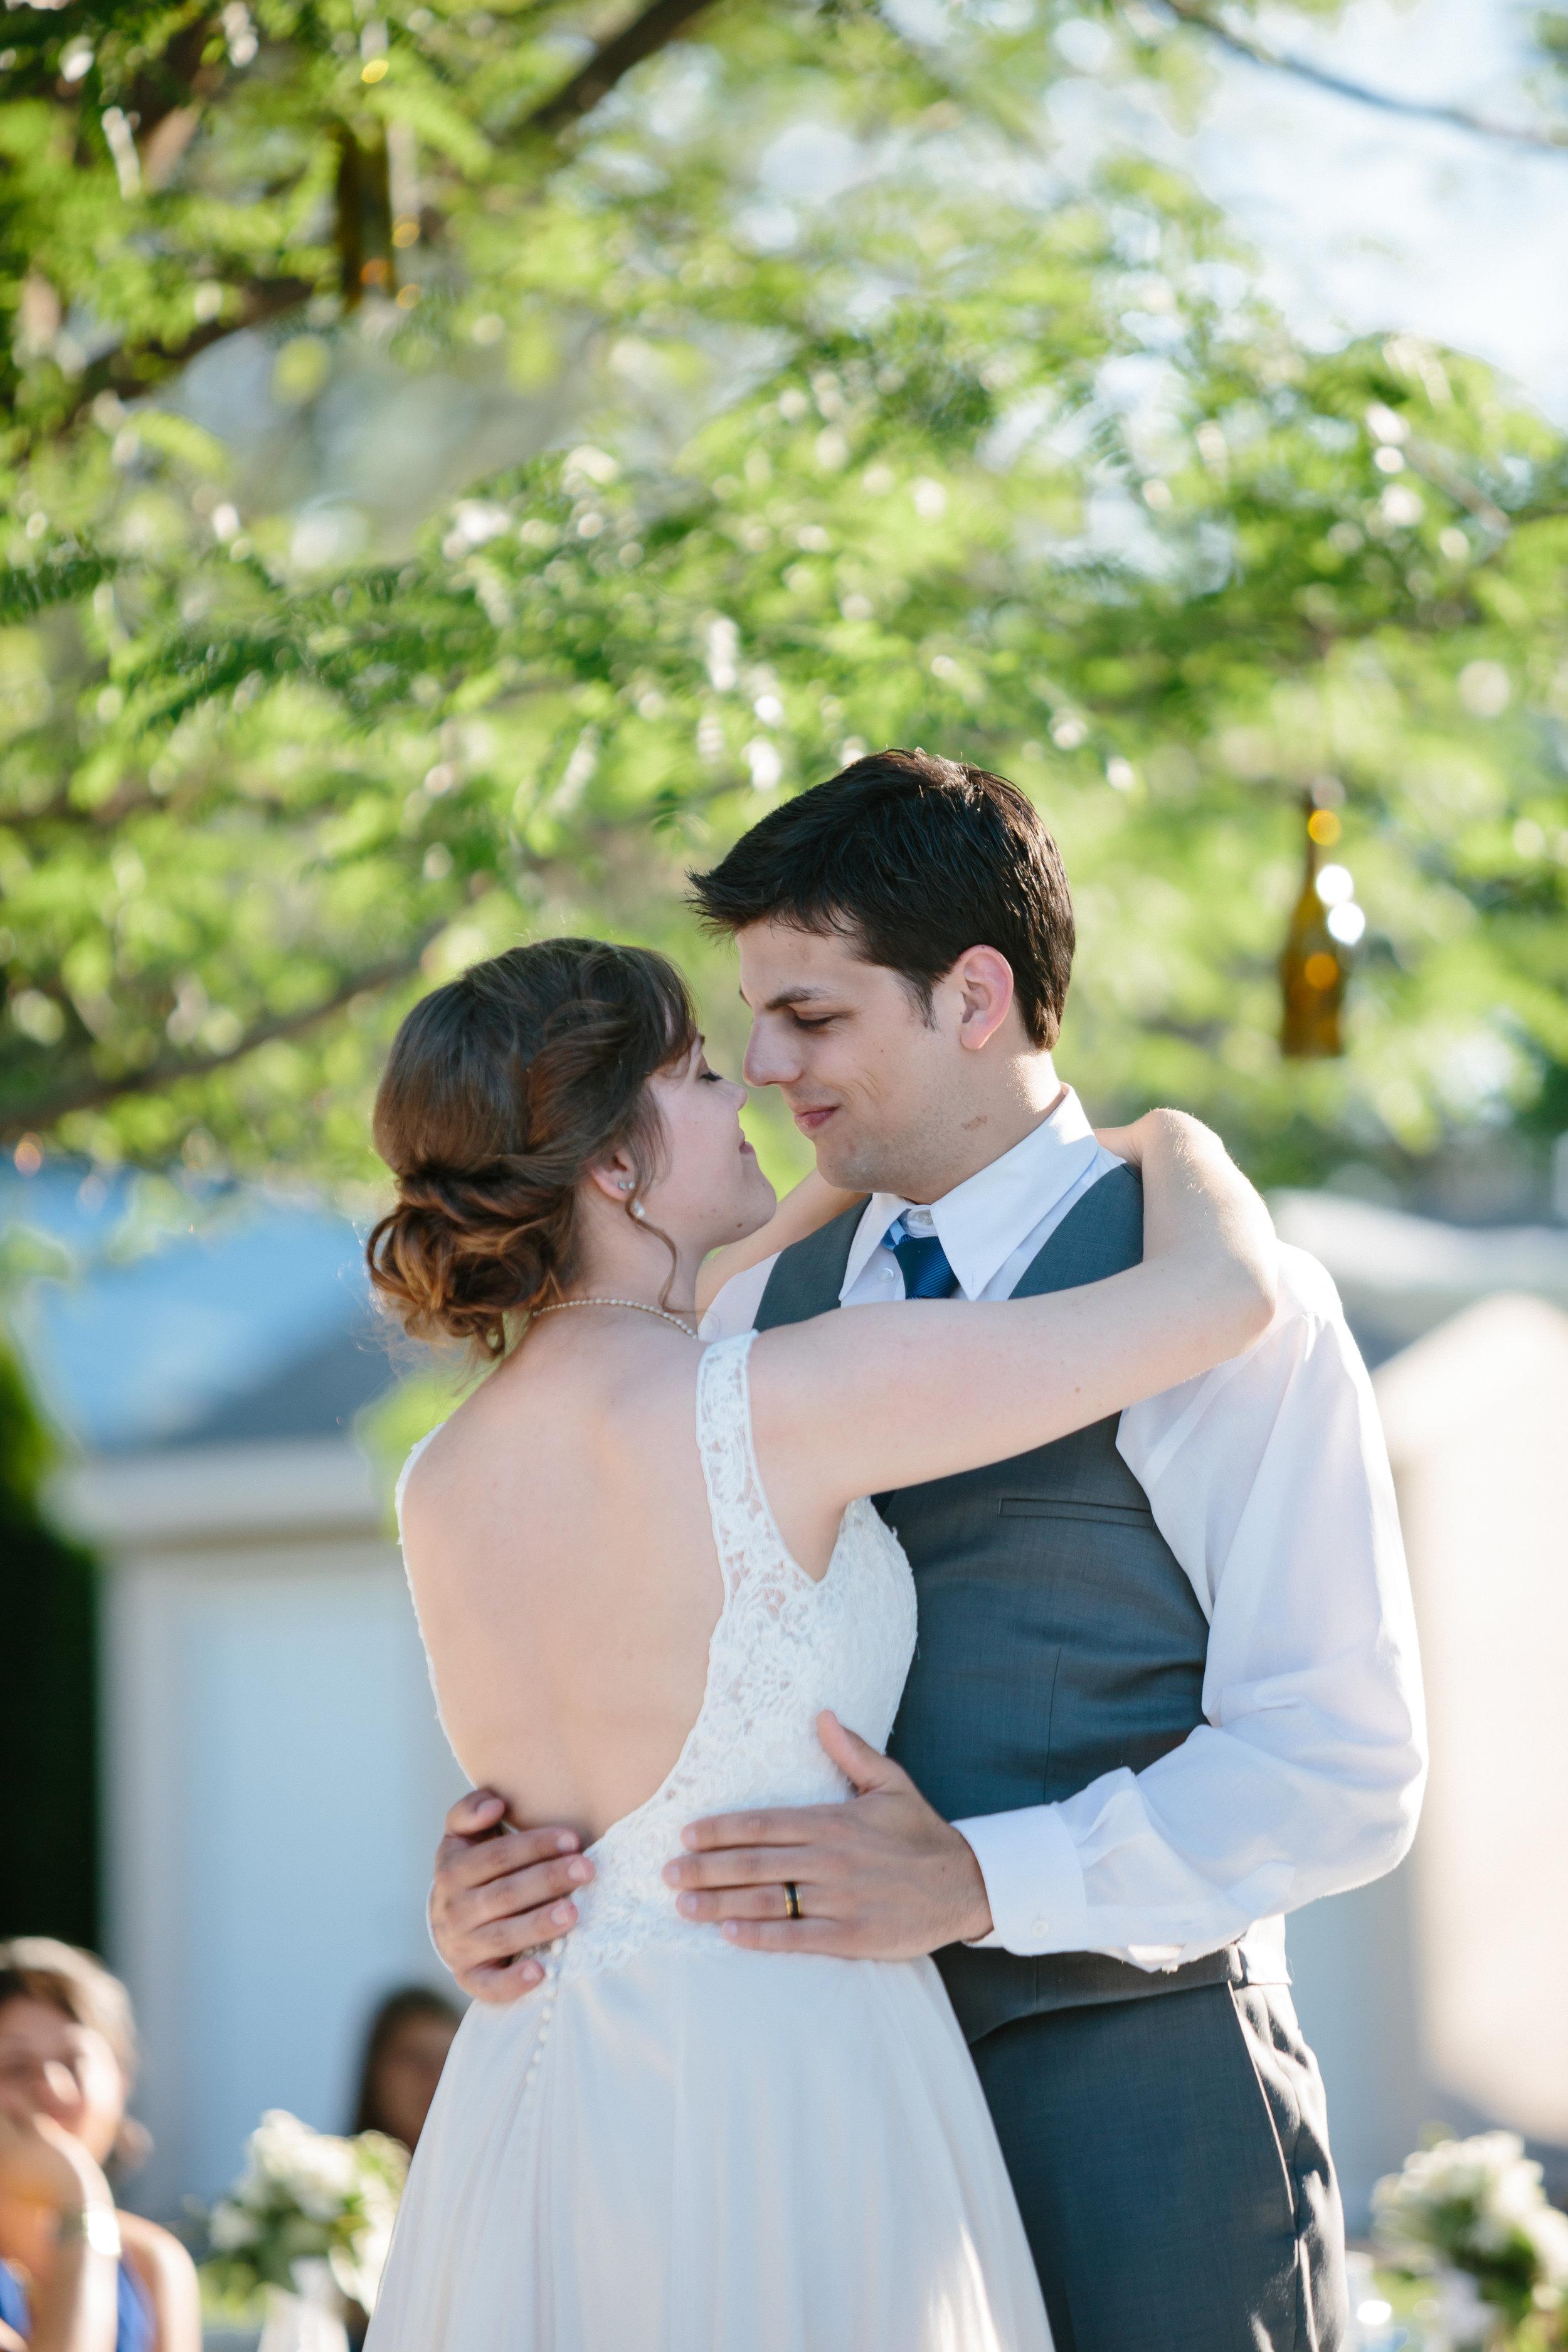 Jordan & Shantel Married - Idaho - Corrie Mick Photography-292.jpg